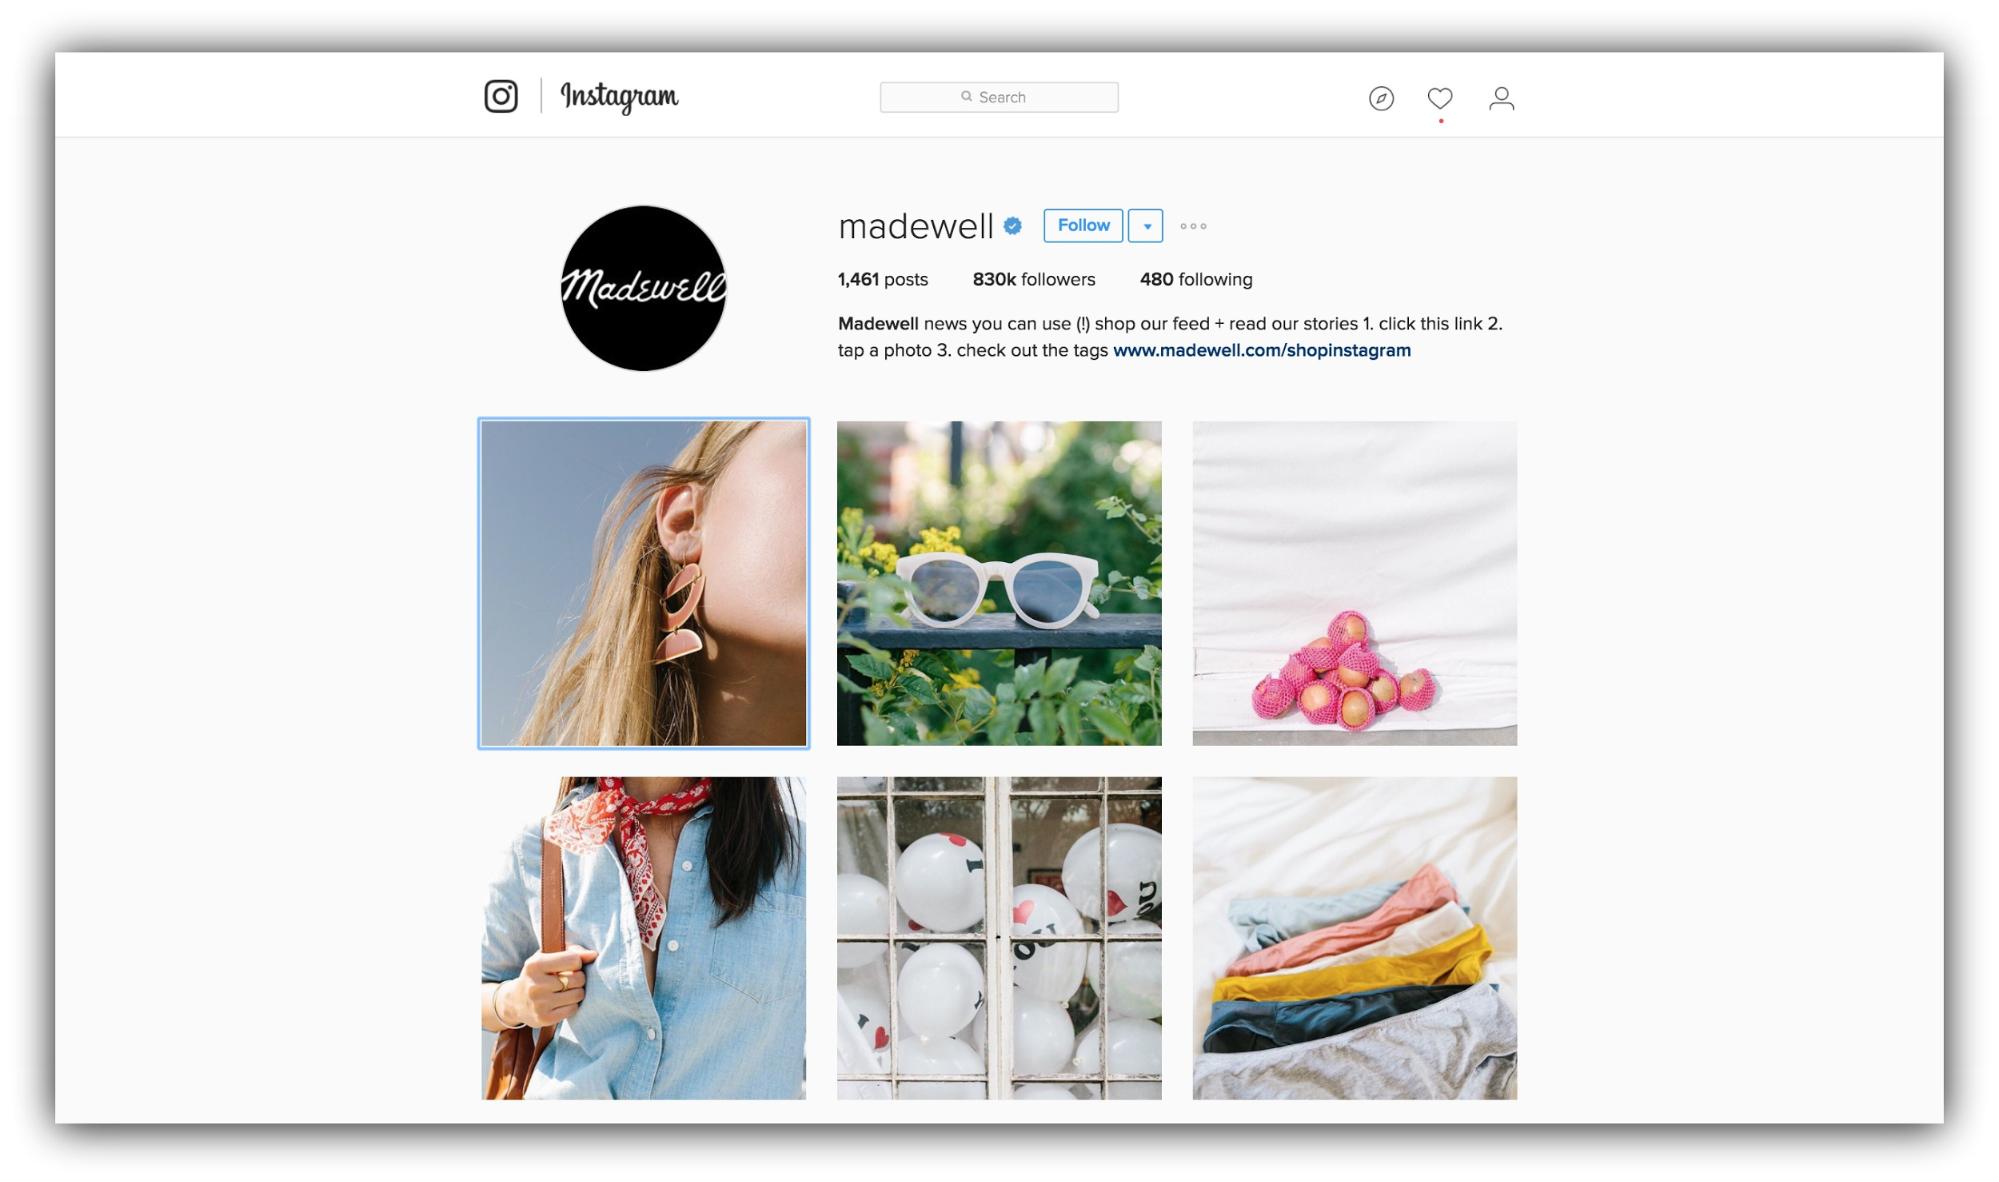 madewell instagram